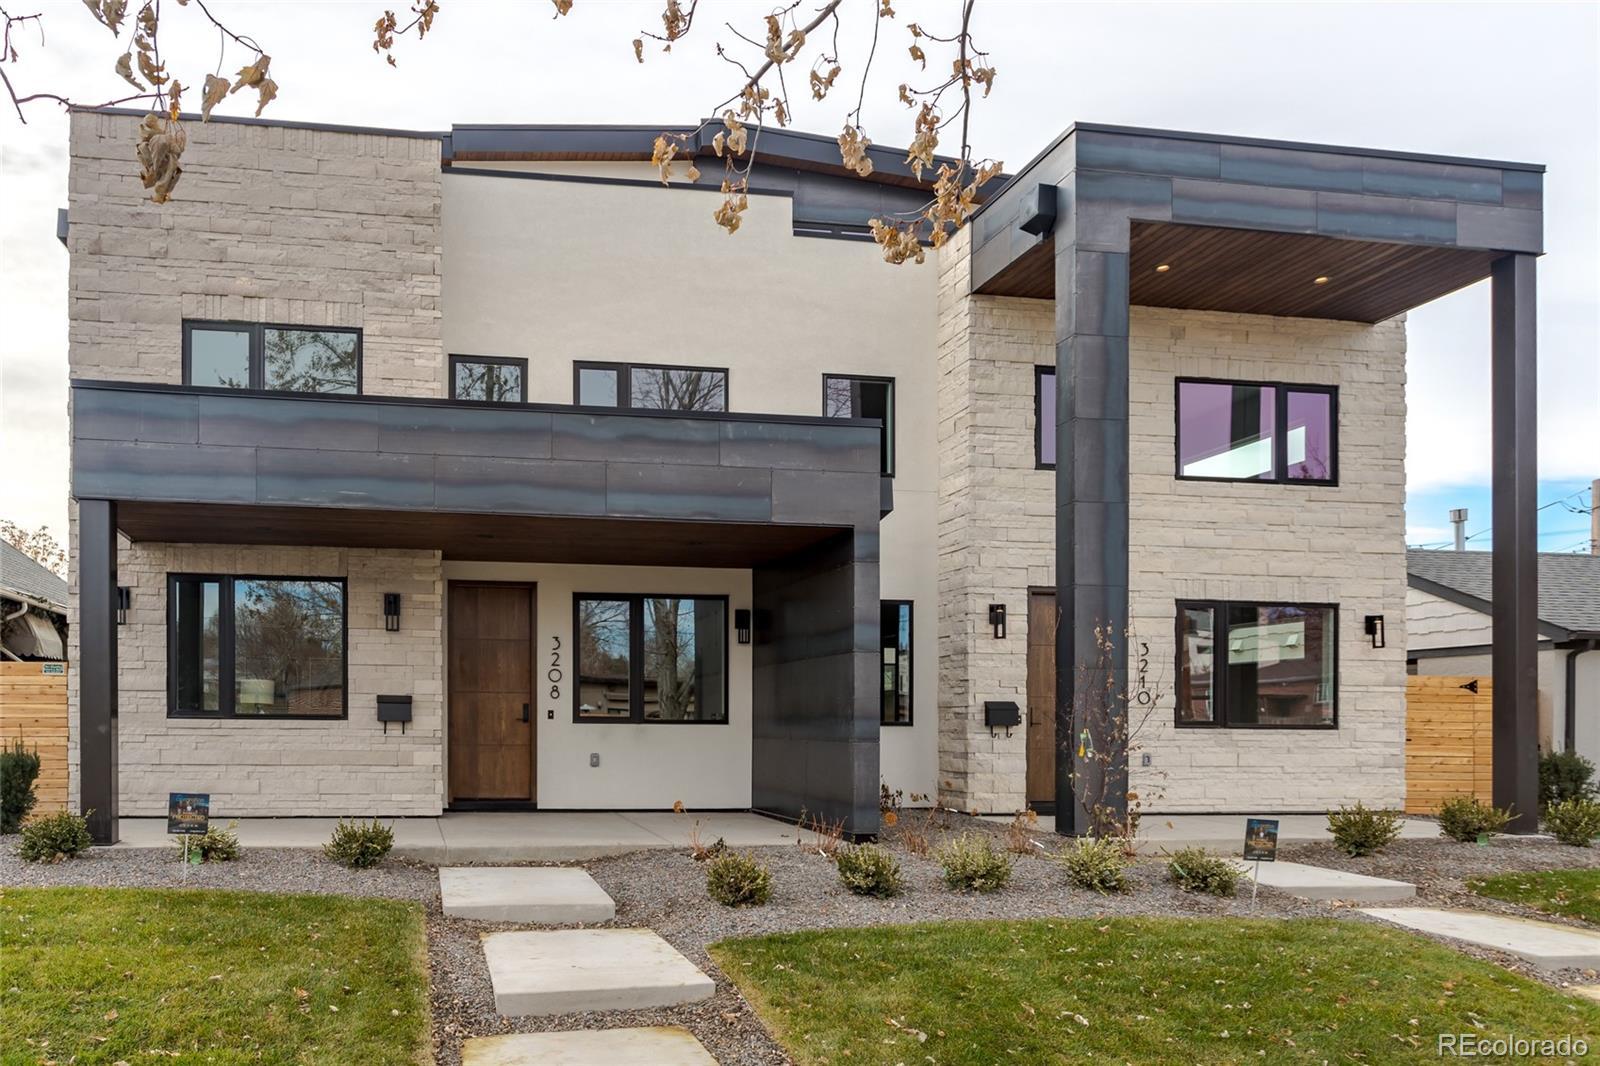 3210 W 27 Avenue, Denver, CO 80211 - Denver, CO real estate listing